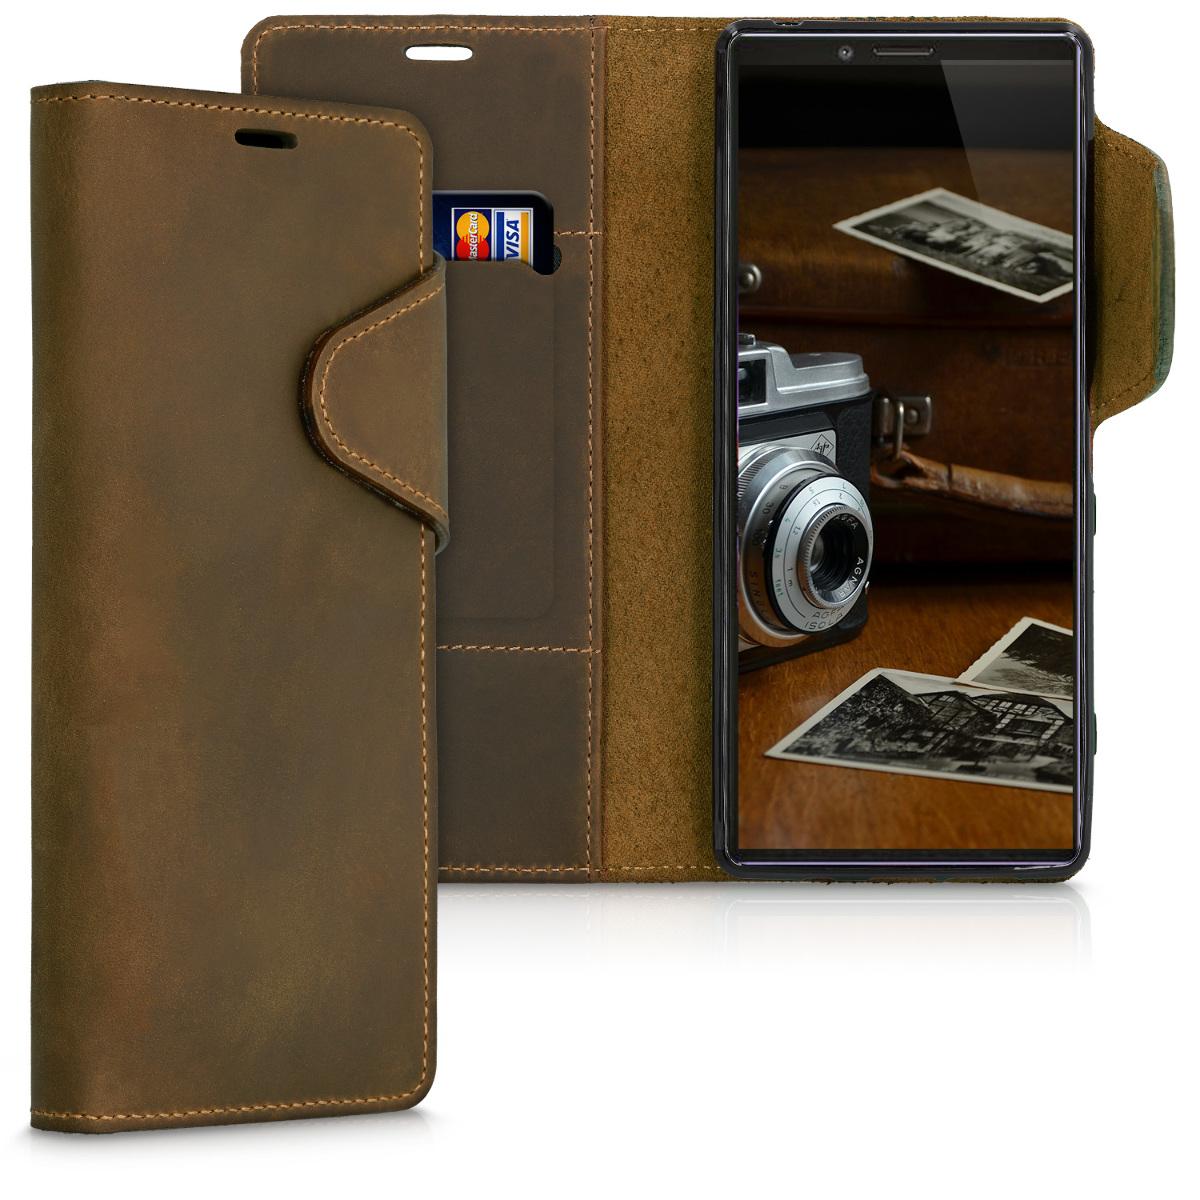 Kalibri Δερμάτινη Suede Θήκη - Πορτοφόλι Sony Xperia 1 - Brown (49414.05)